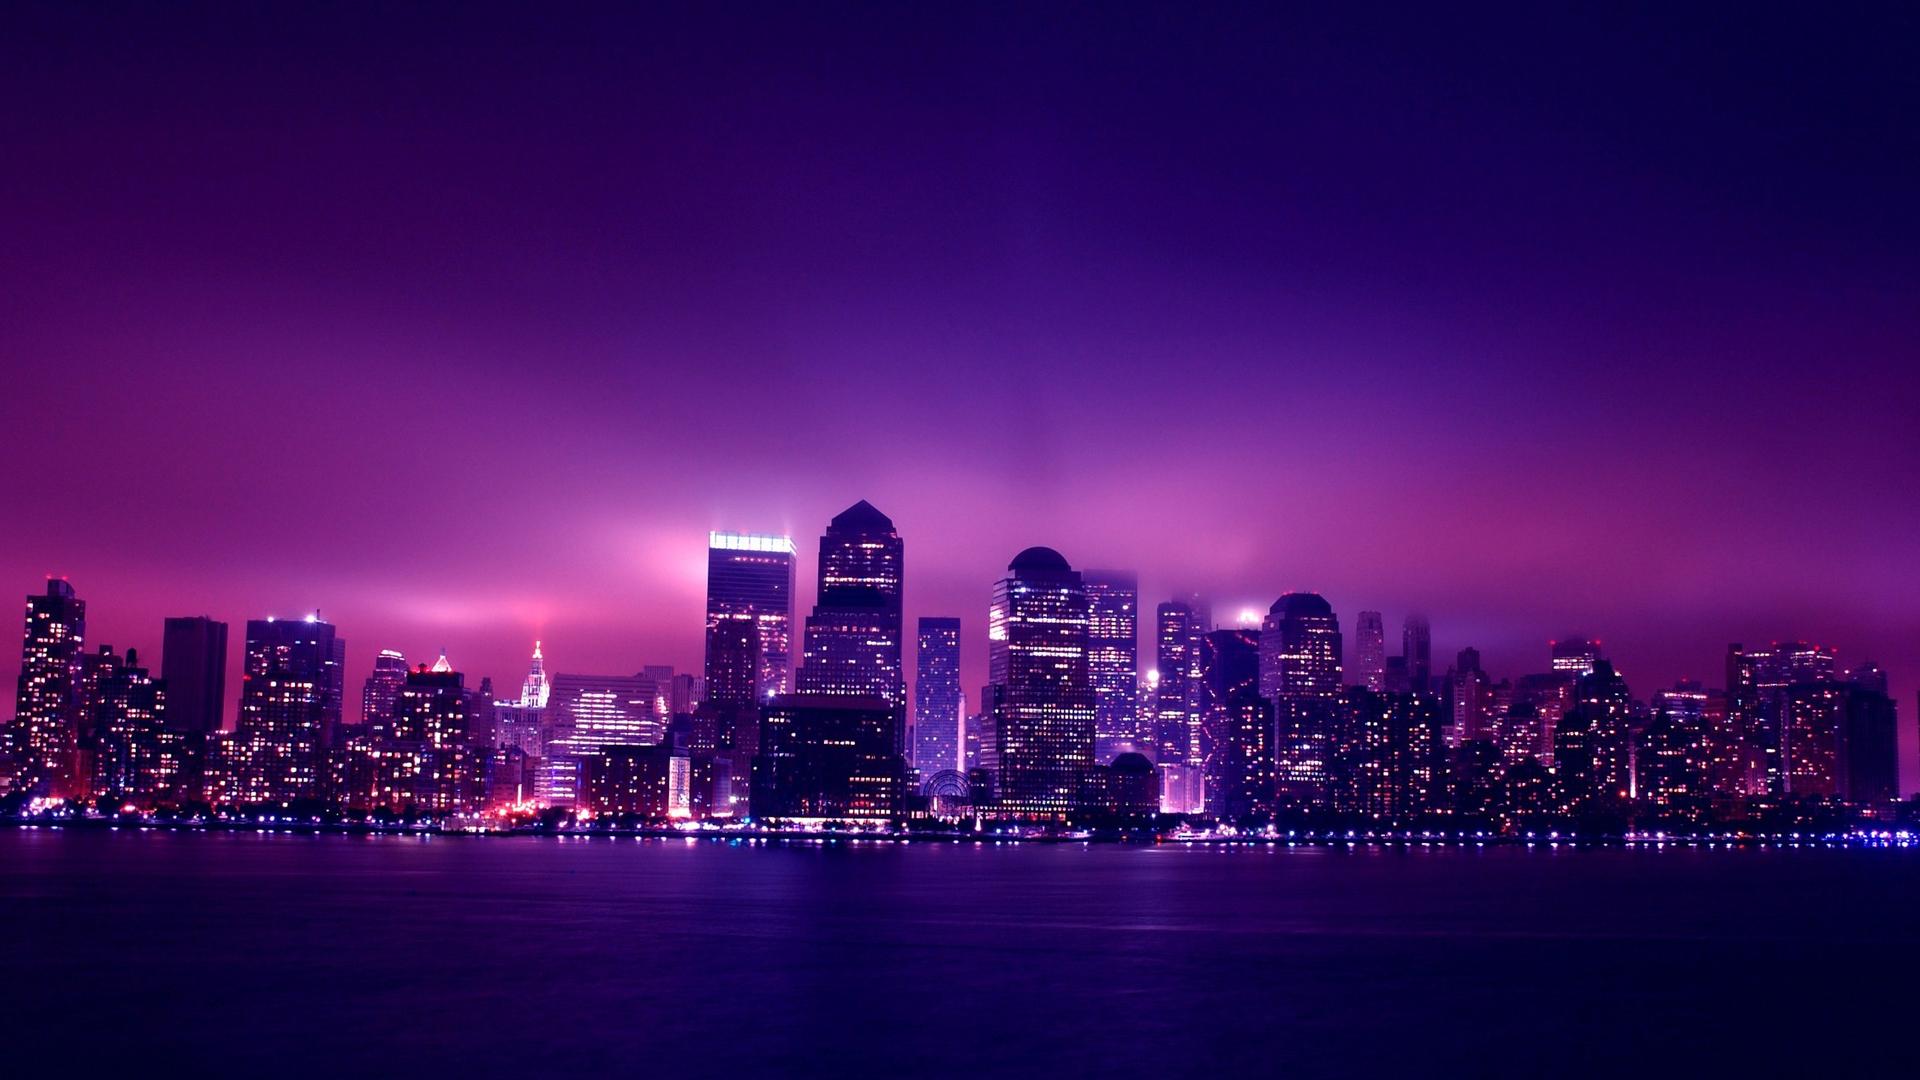 NOLDY- M'AP RETOUNEN - DATE DE SORTIE: 11/02/2021 - ENJOY THE MUSIC !!!